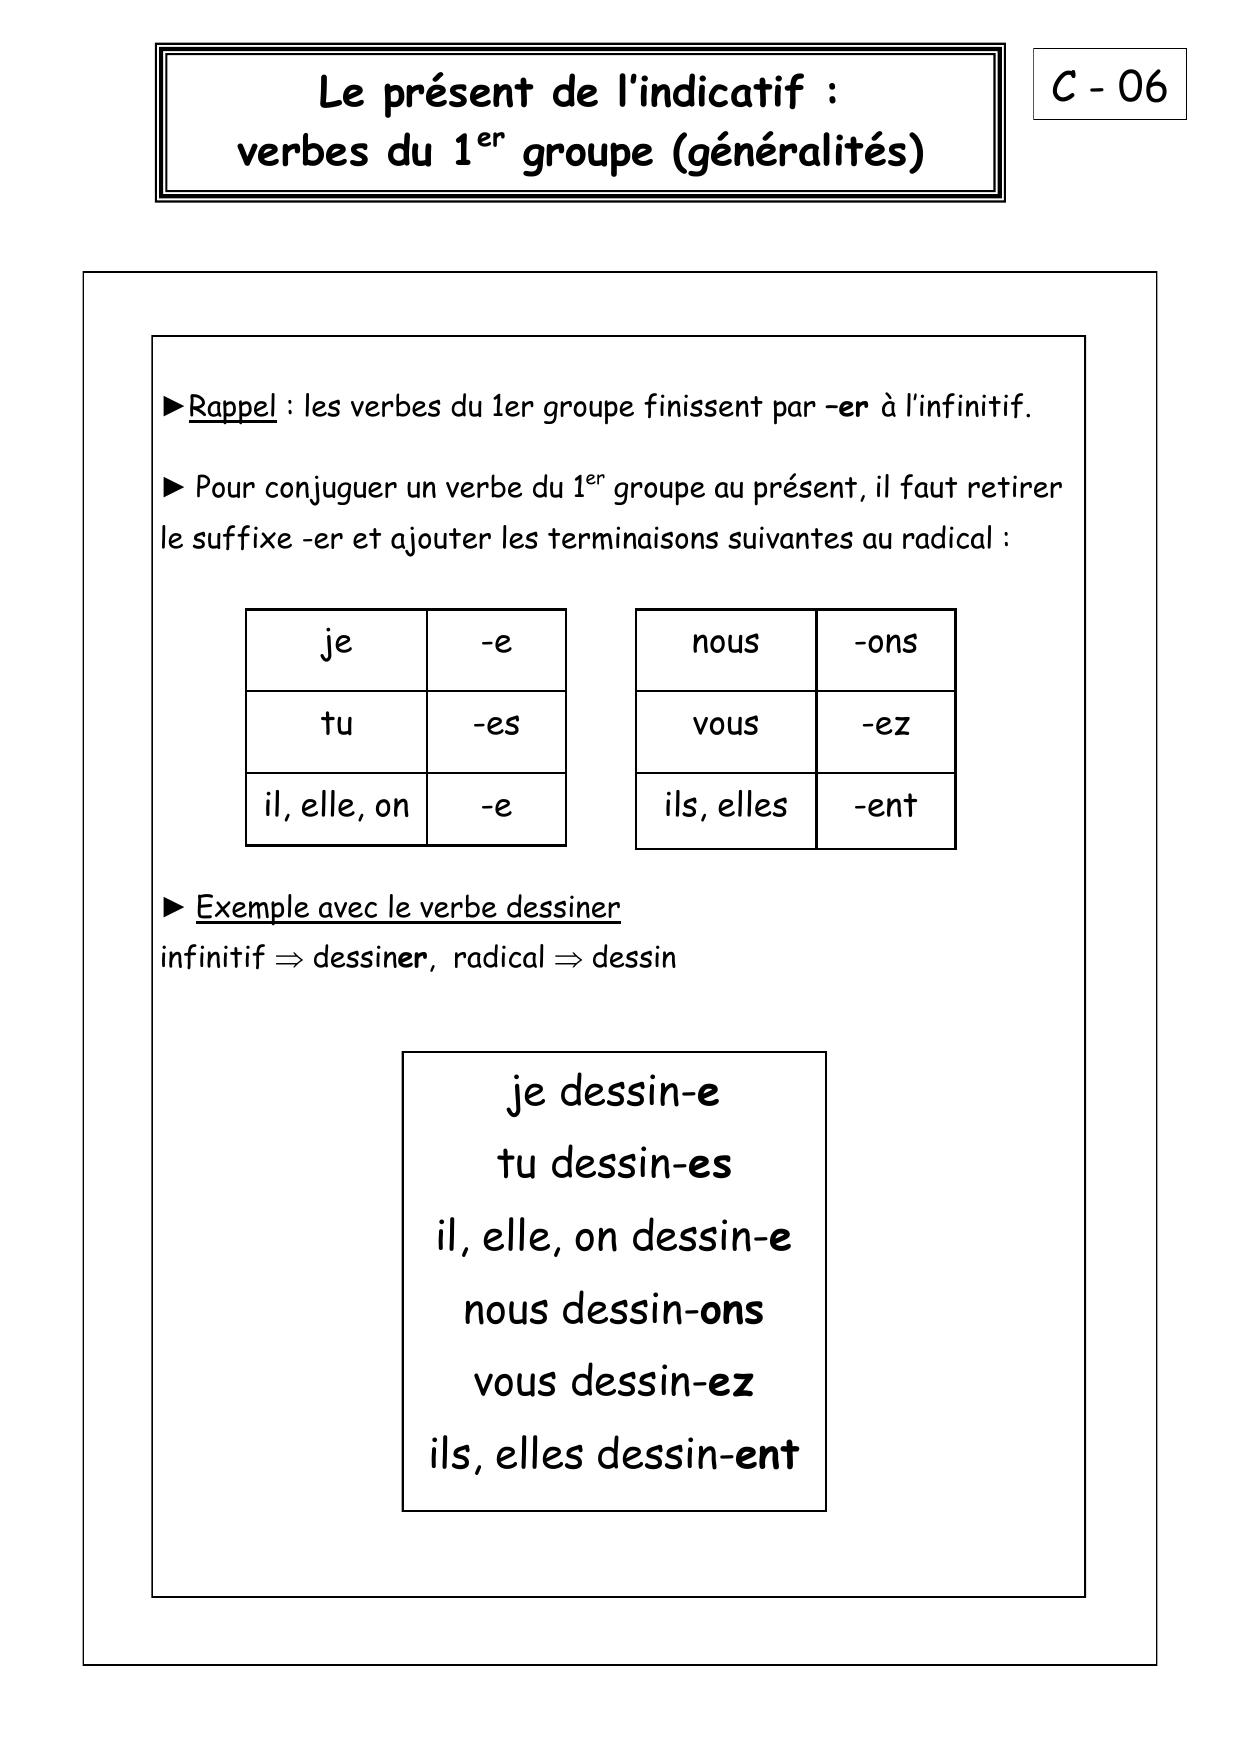 Le Present De L Indicatif Verbes Du 1er Groupe Generalites C